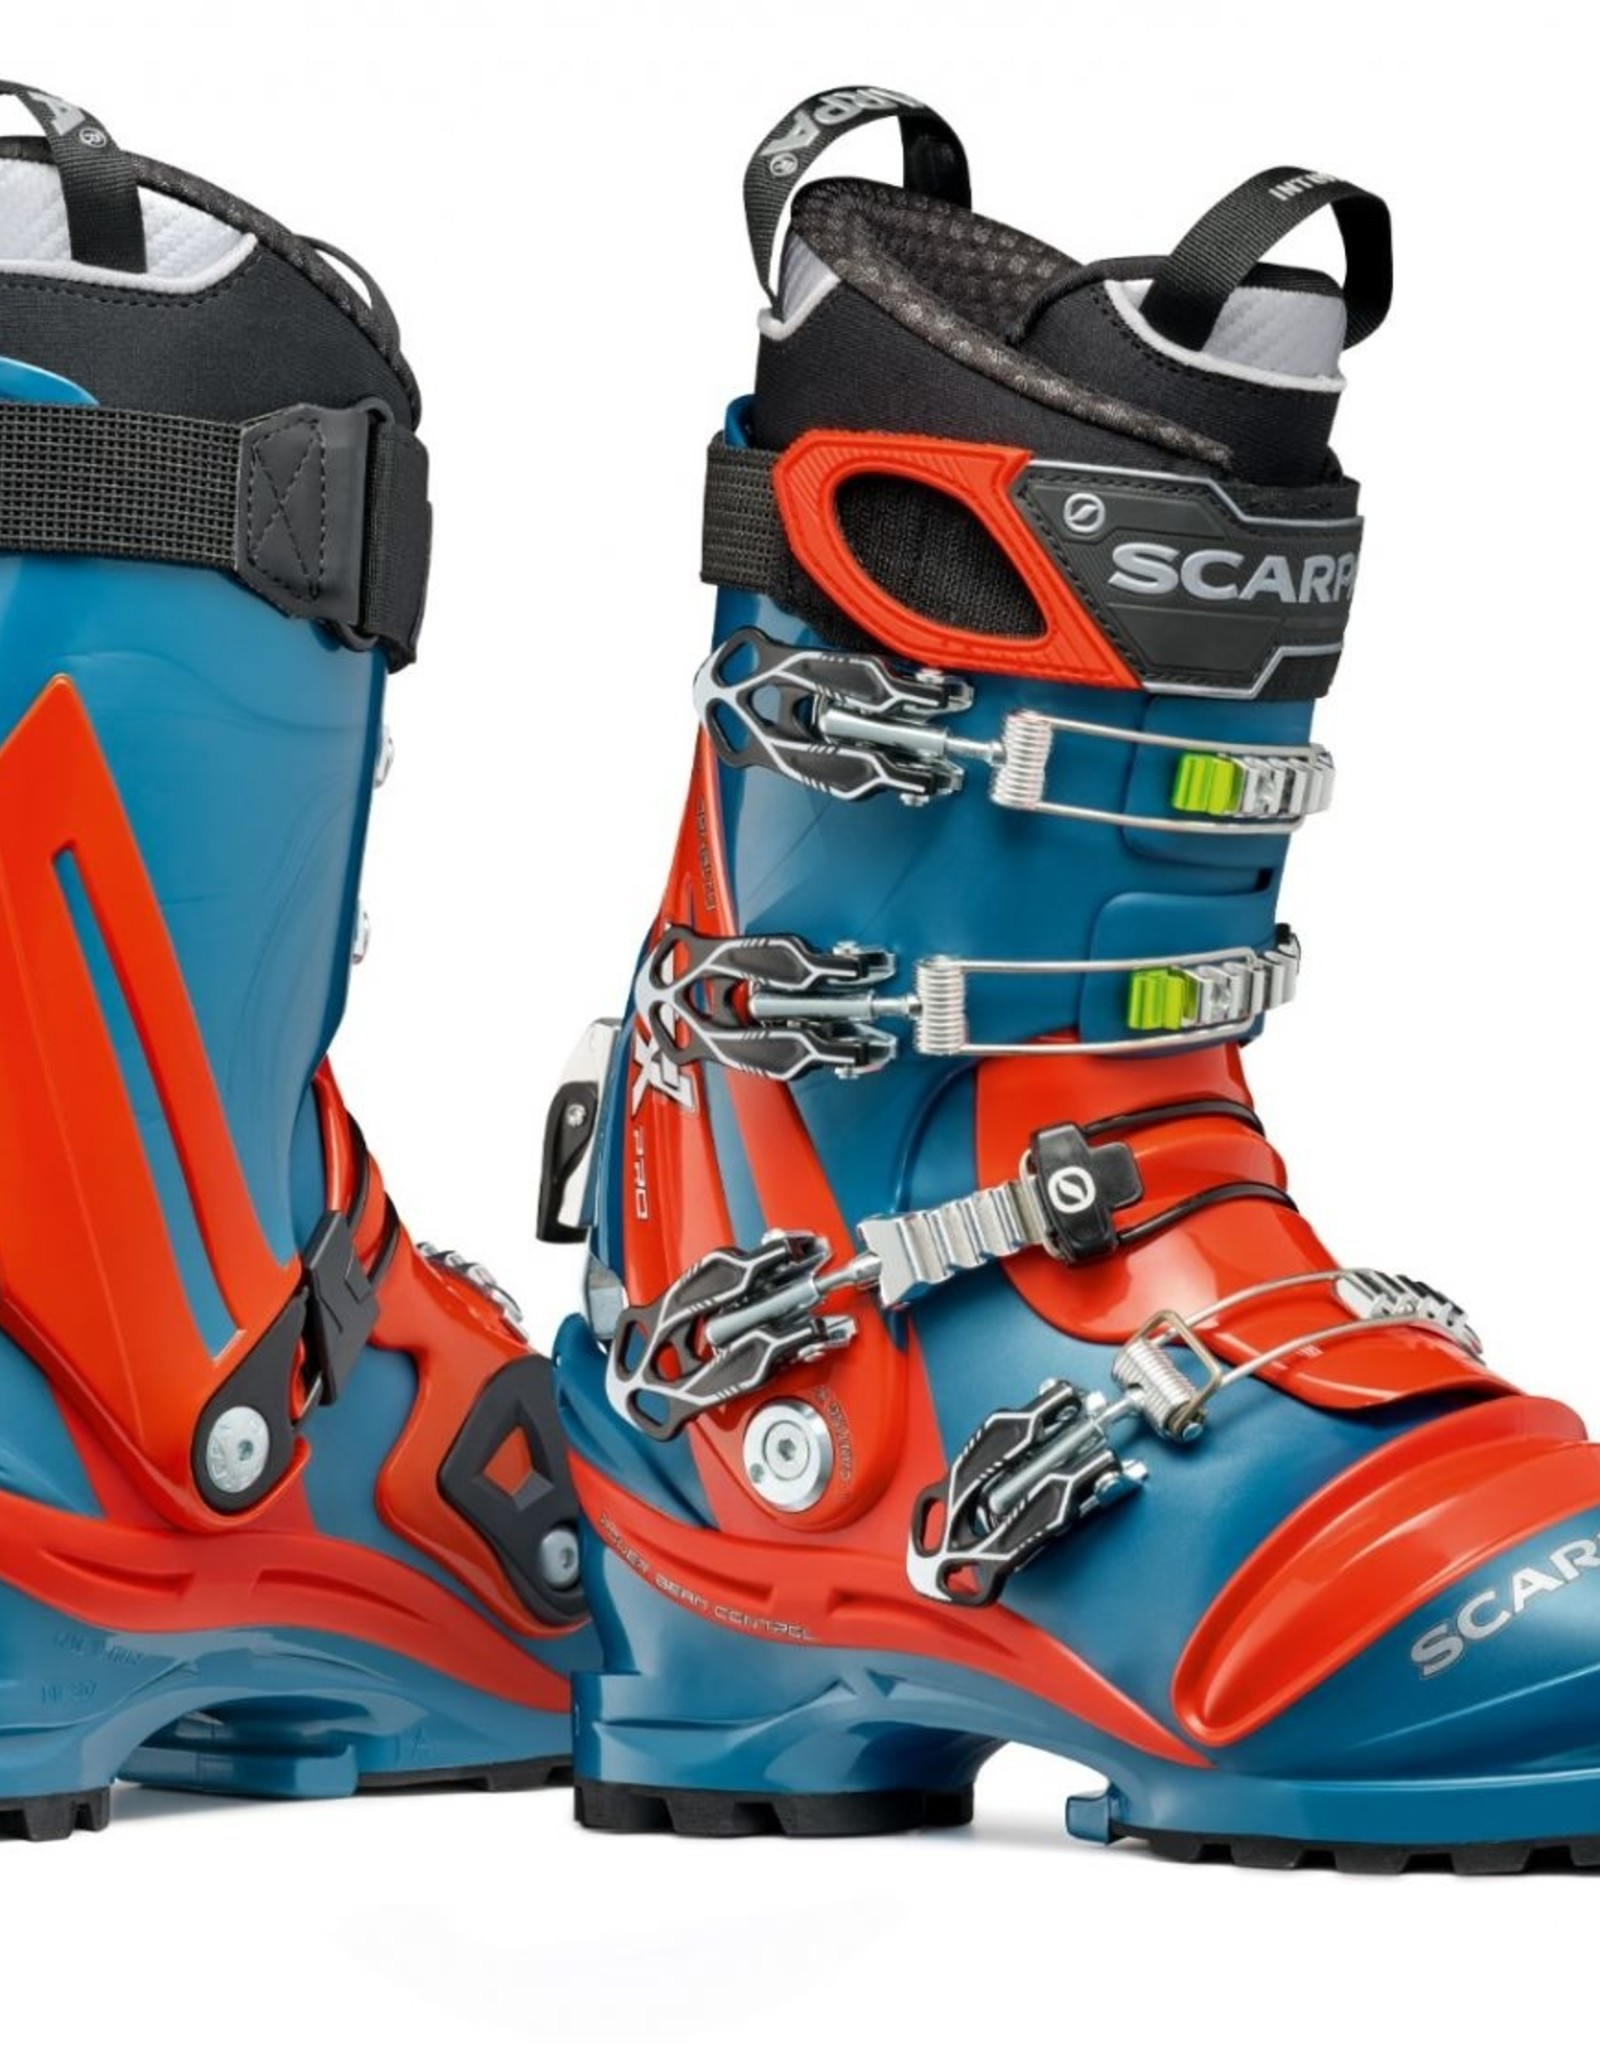 Scarpa SCARPA 2021 TX PRO Men's TELEMARK SKI BOOT